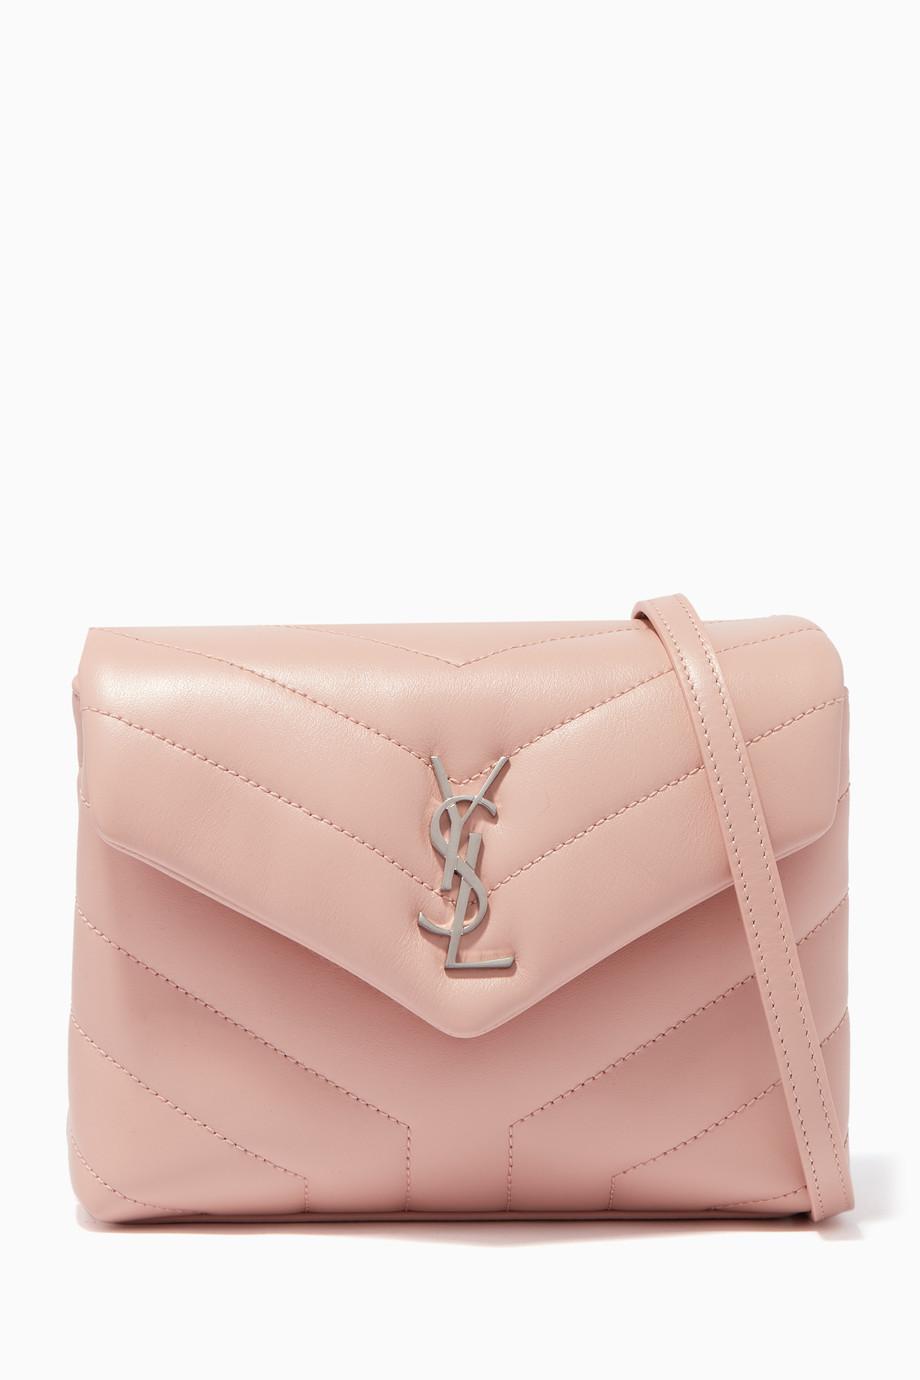 82d93ff308789 تسوق حقيبة كروس لولو توي وردية باهتة سان لوران وردي للنساء